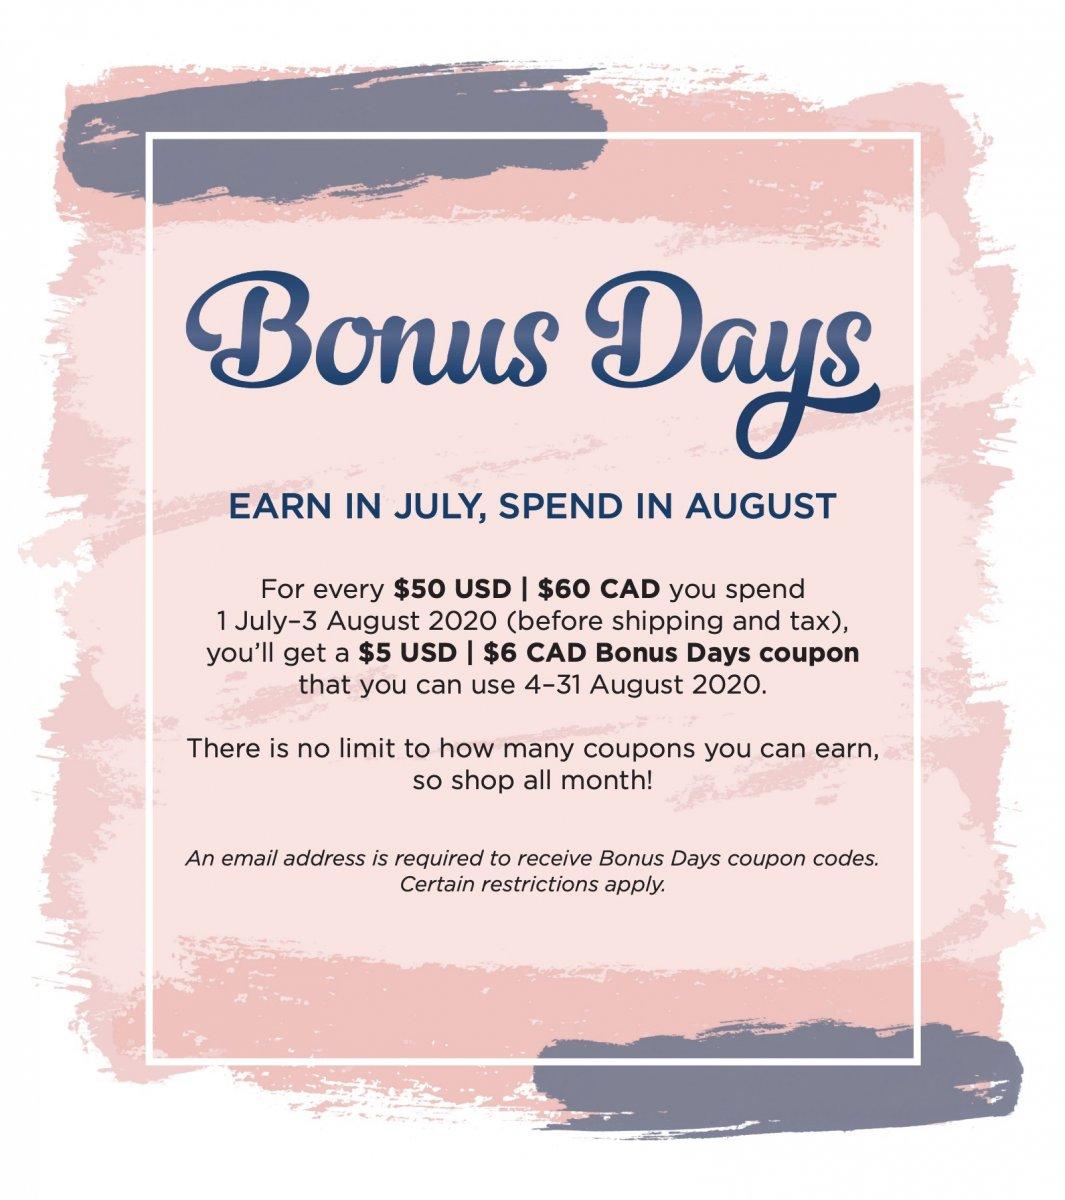 Earn Coupons with Bonus Days